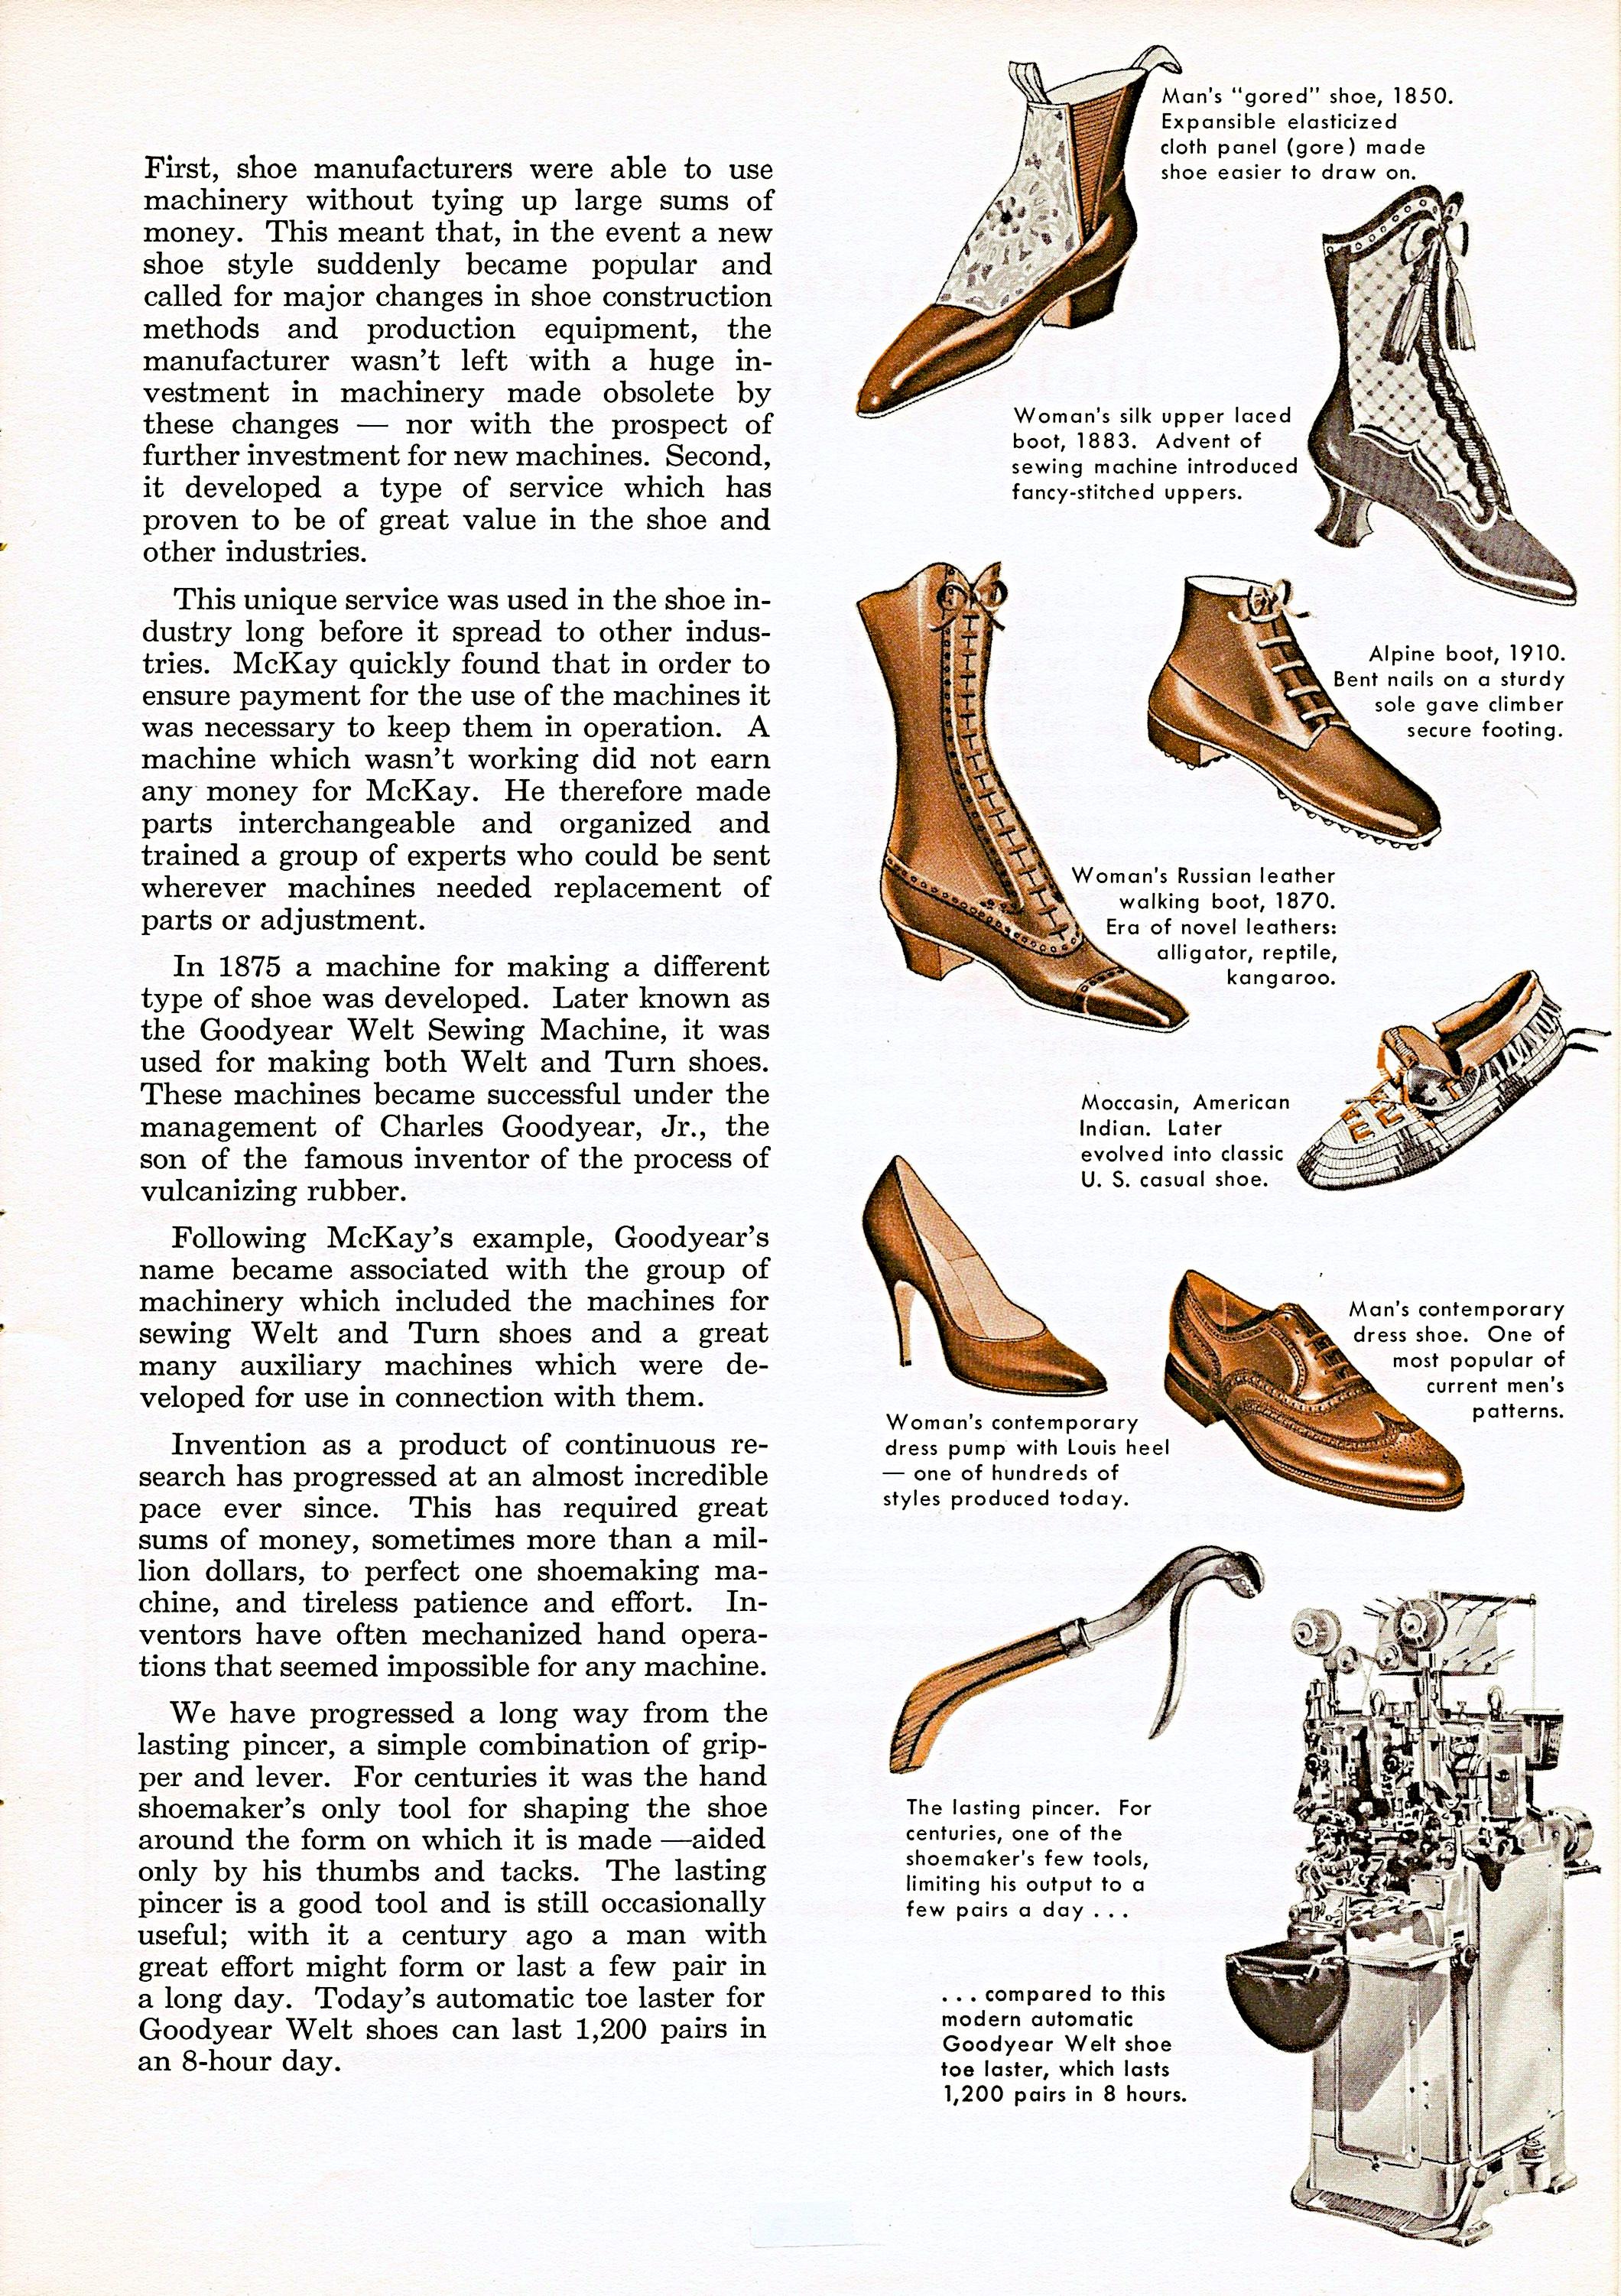 Source: United Shoe Machinery Corporation